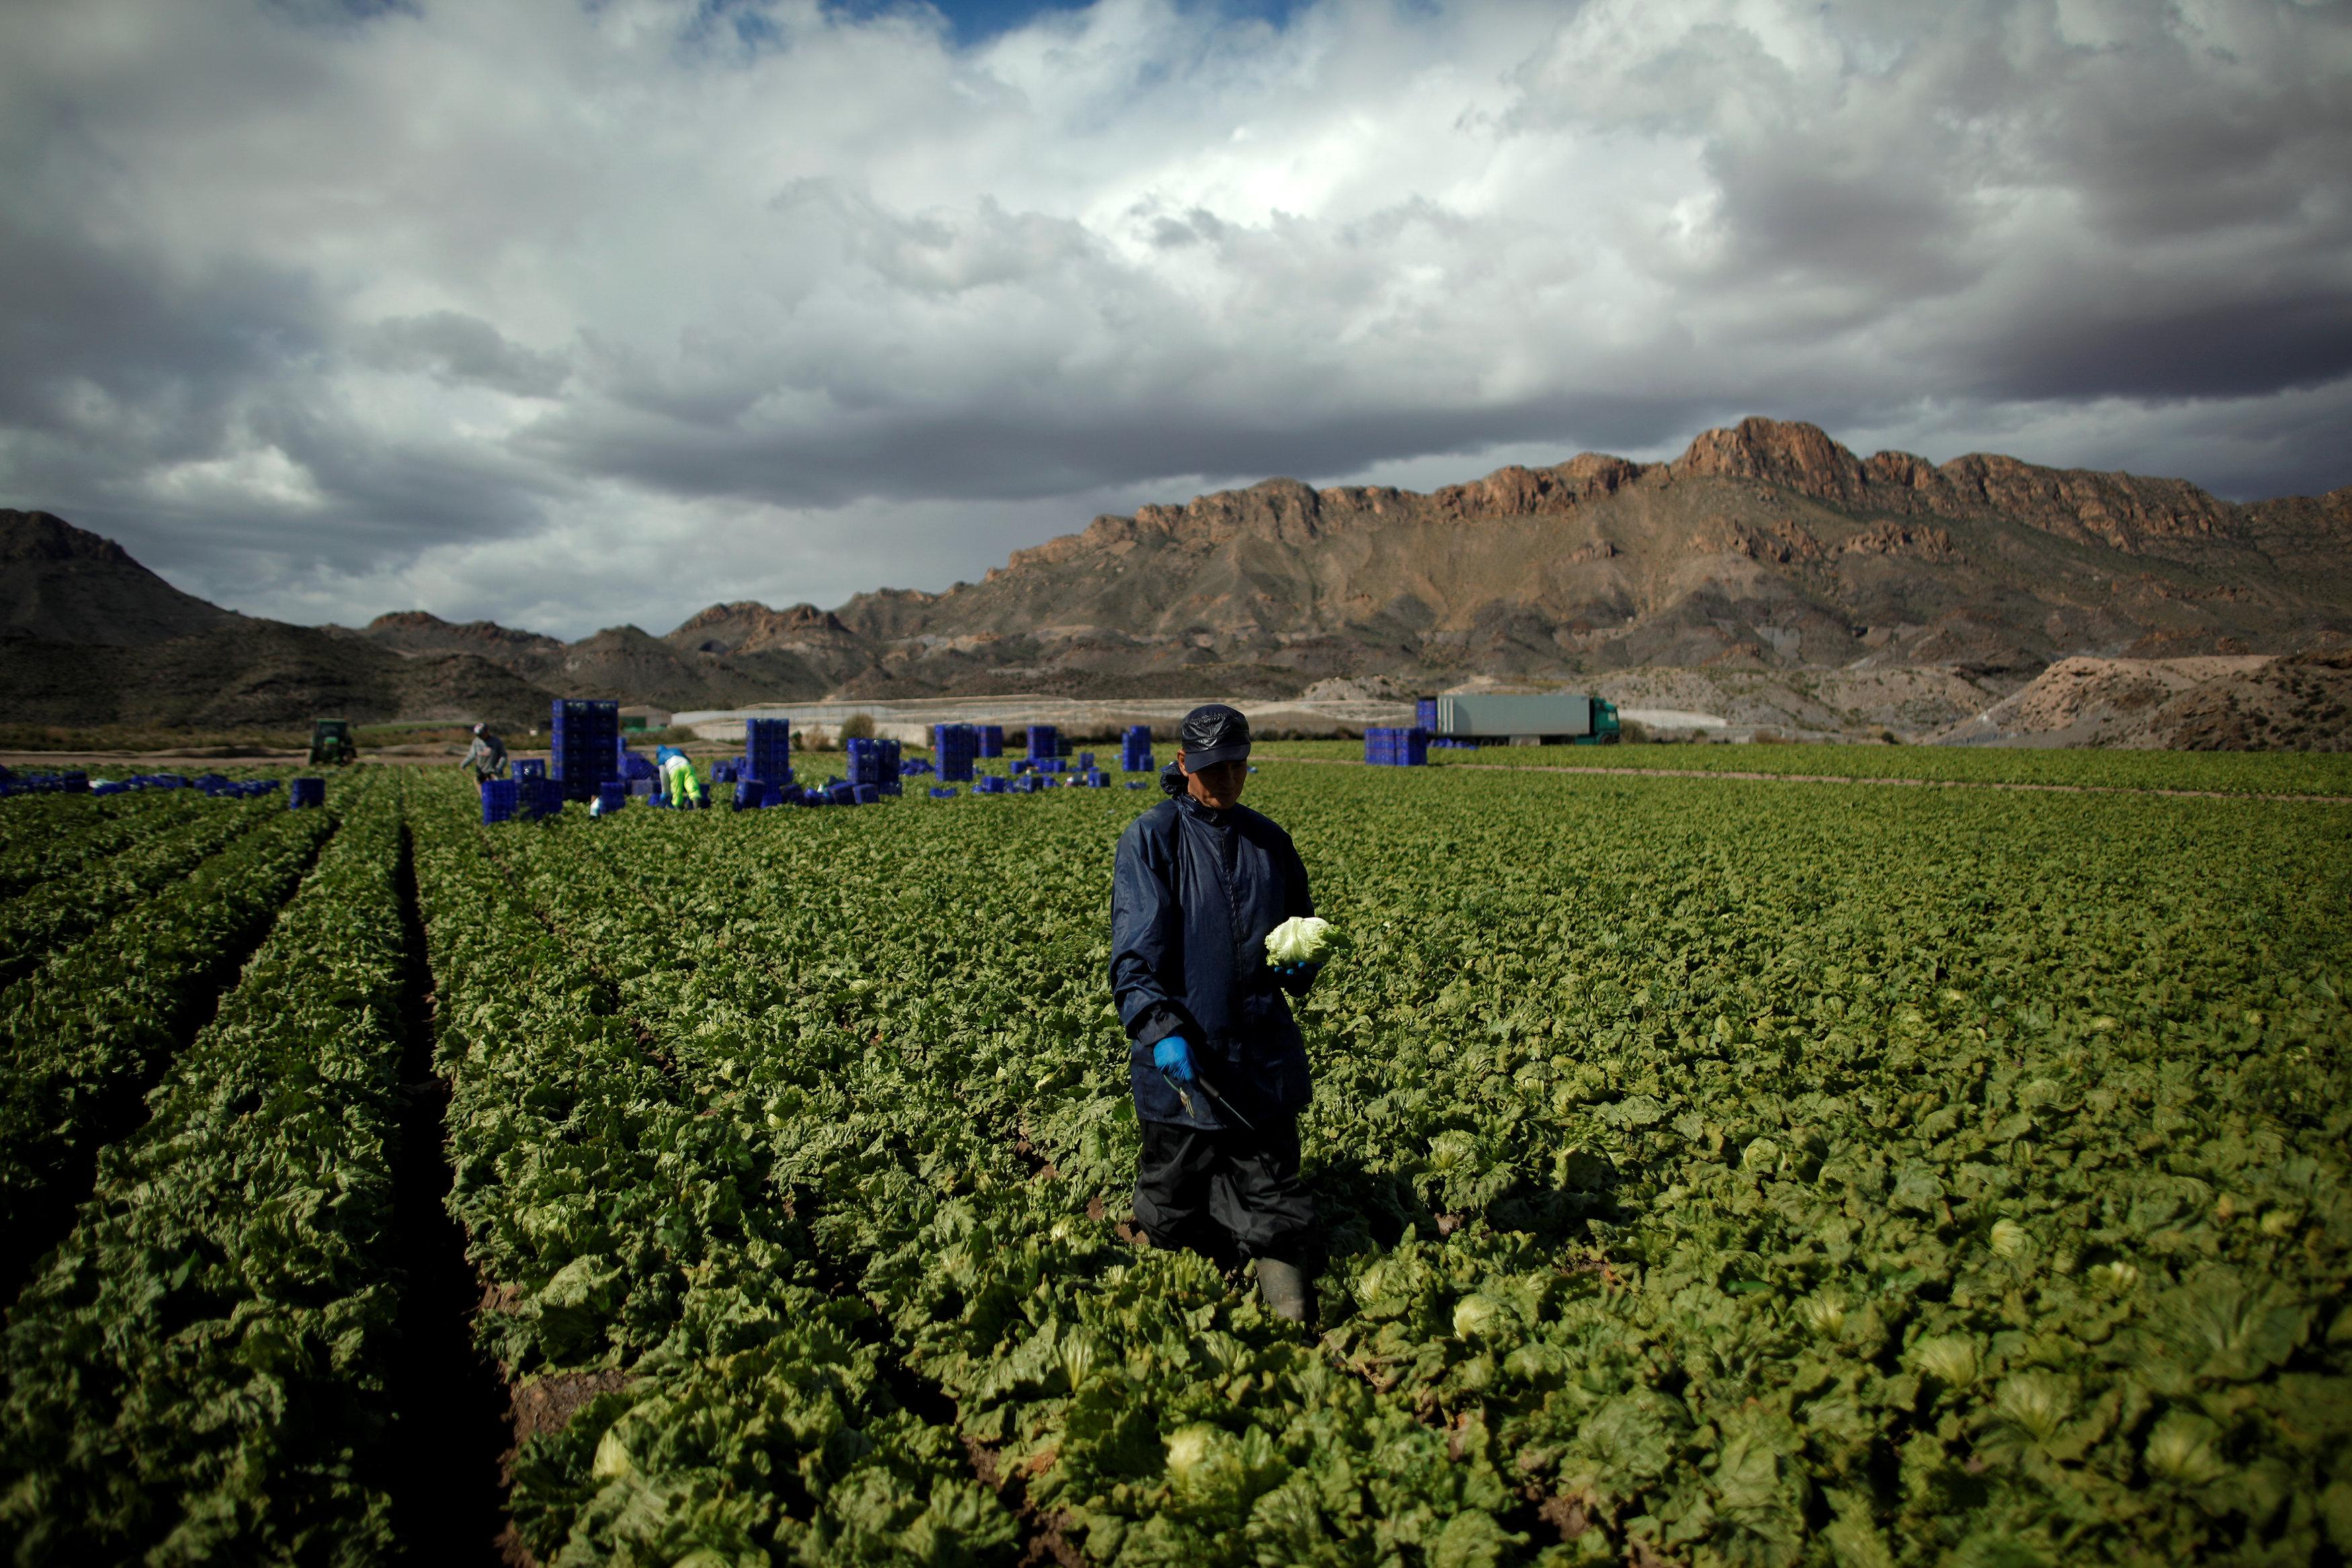 iceberg lettuce farm